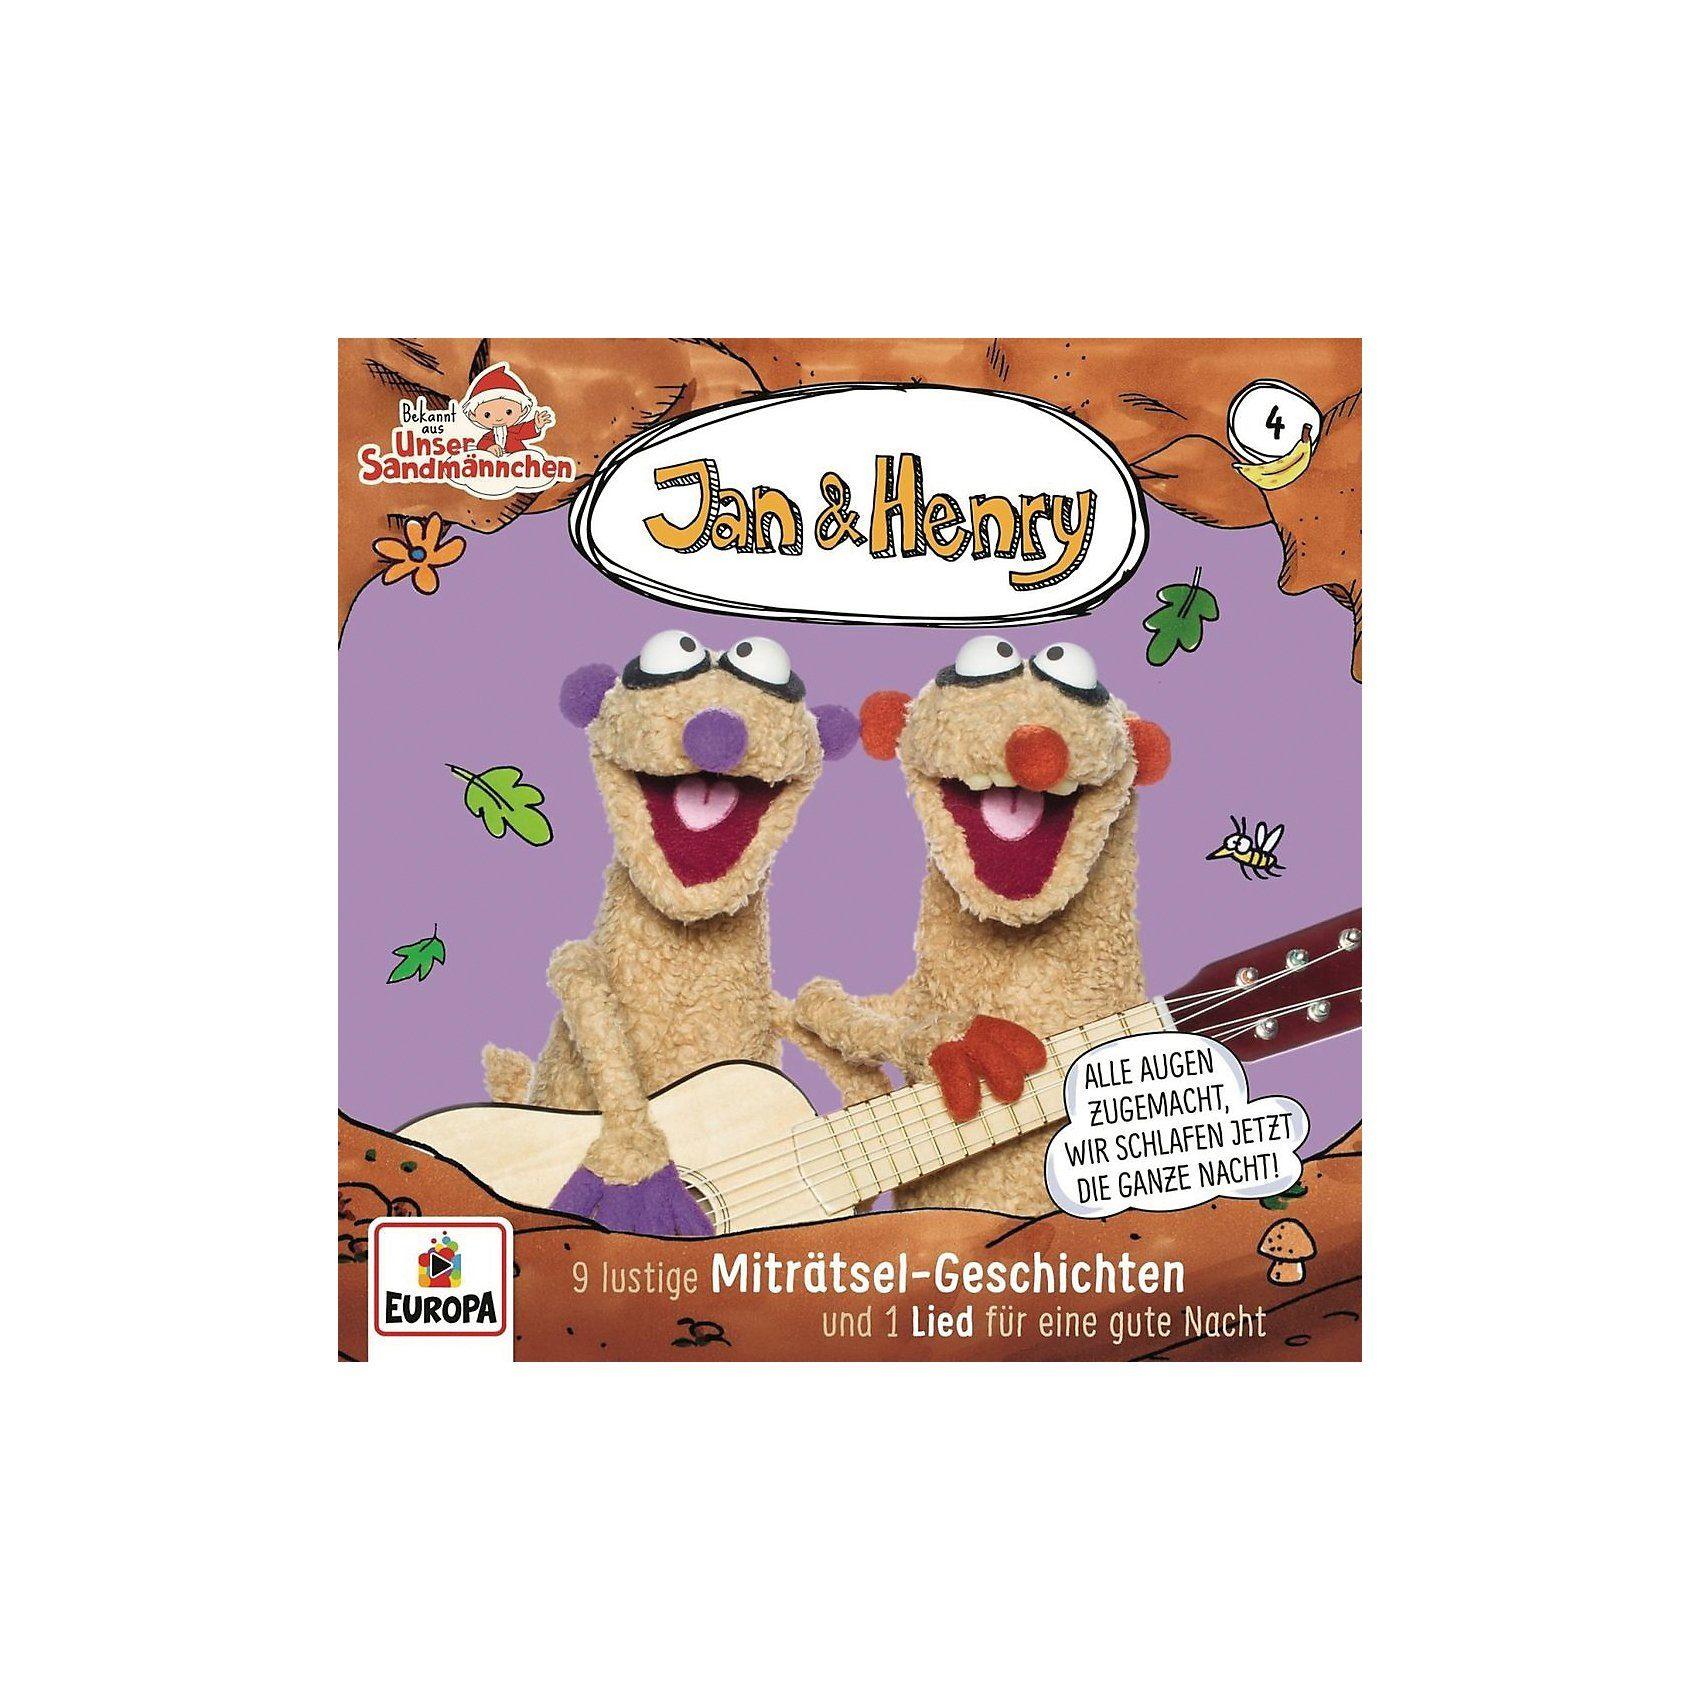 Sony CD Jan & Henry 04 - 9 Rätsel und 1 Lied